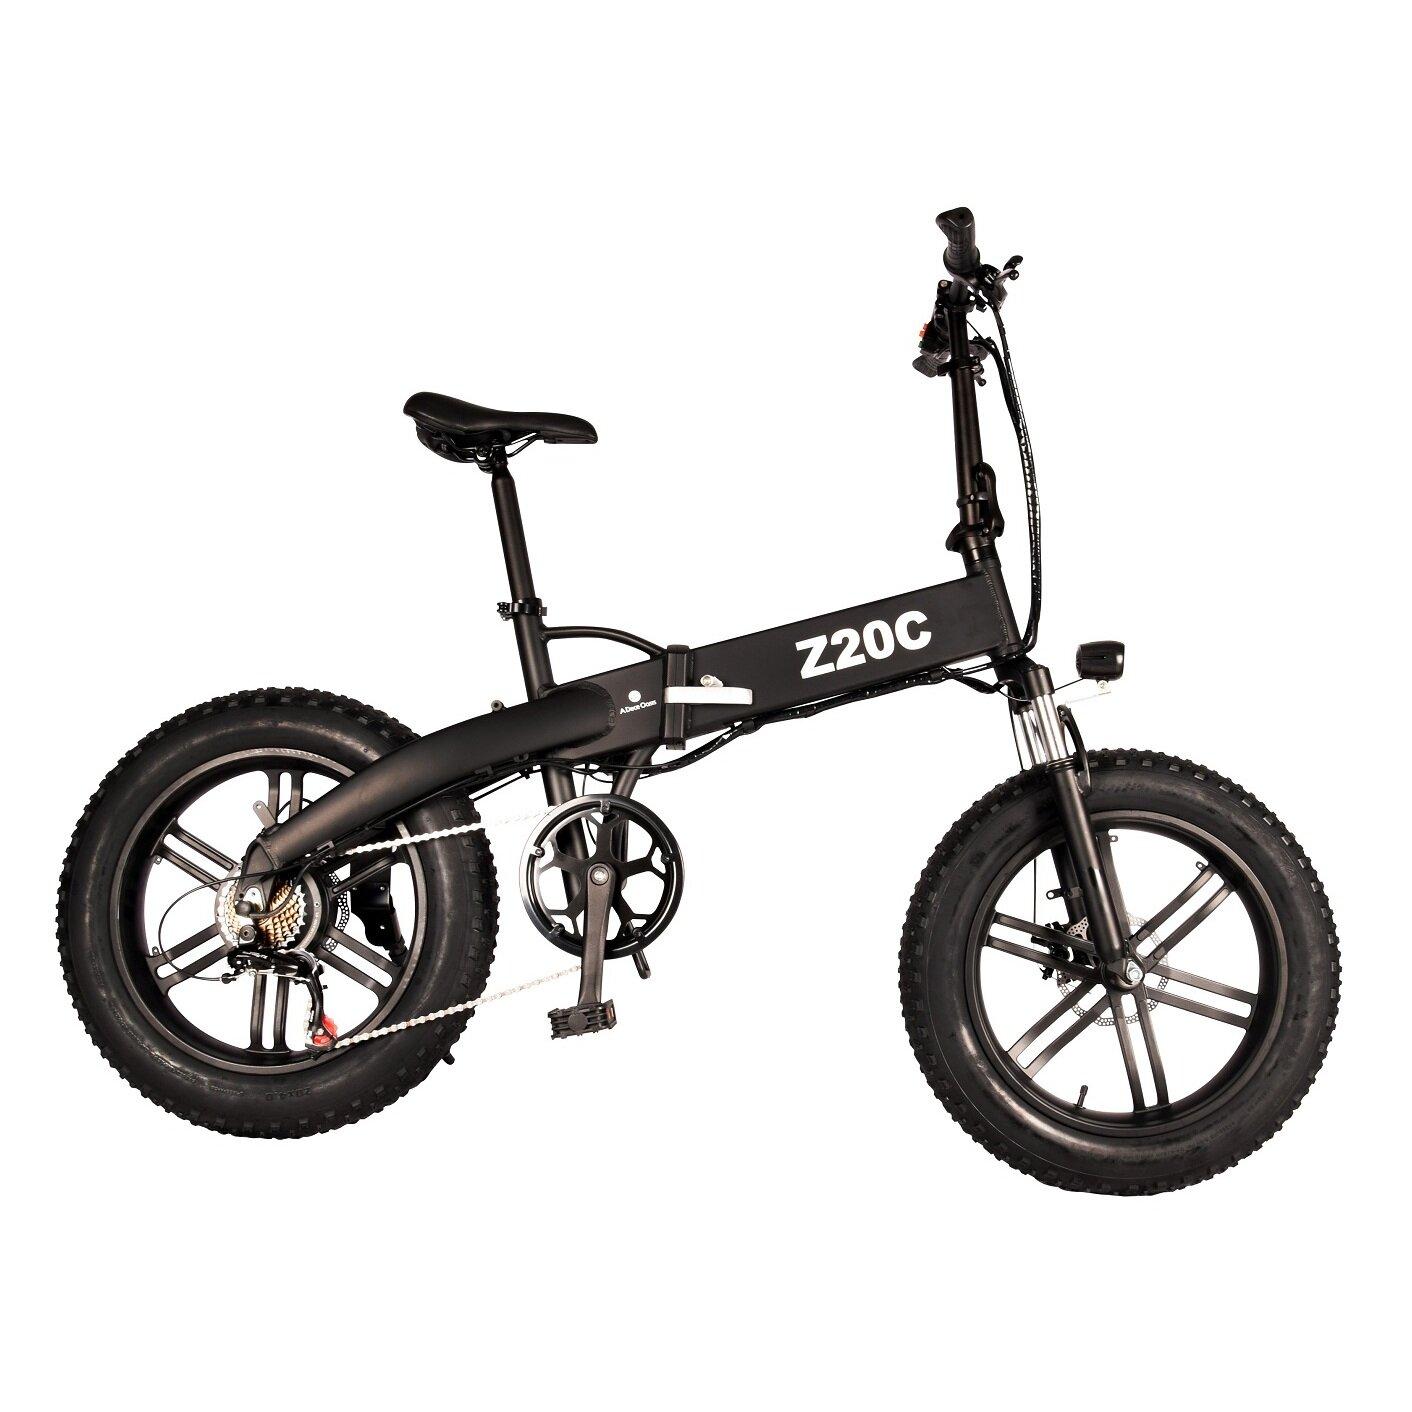 [EU DIRECT] ADO Z20C 10AH 36V 250W Folding Electric Bike 20inch Snow Fat Tire 25km/h Top Speed 80km Mileage Range 6-speed Transmission Smart Display Dual Disc Brake